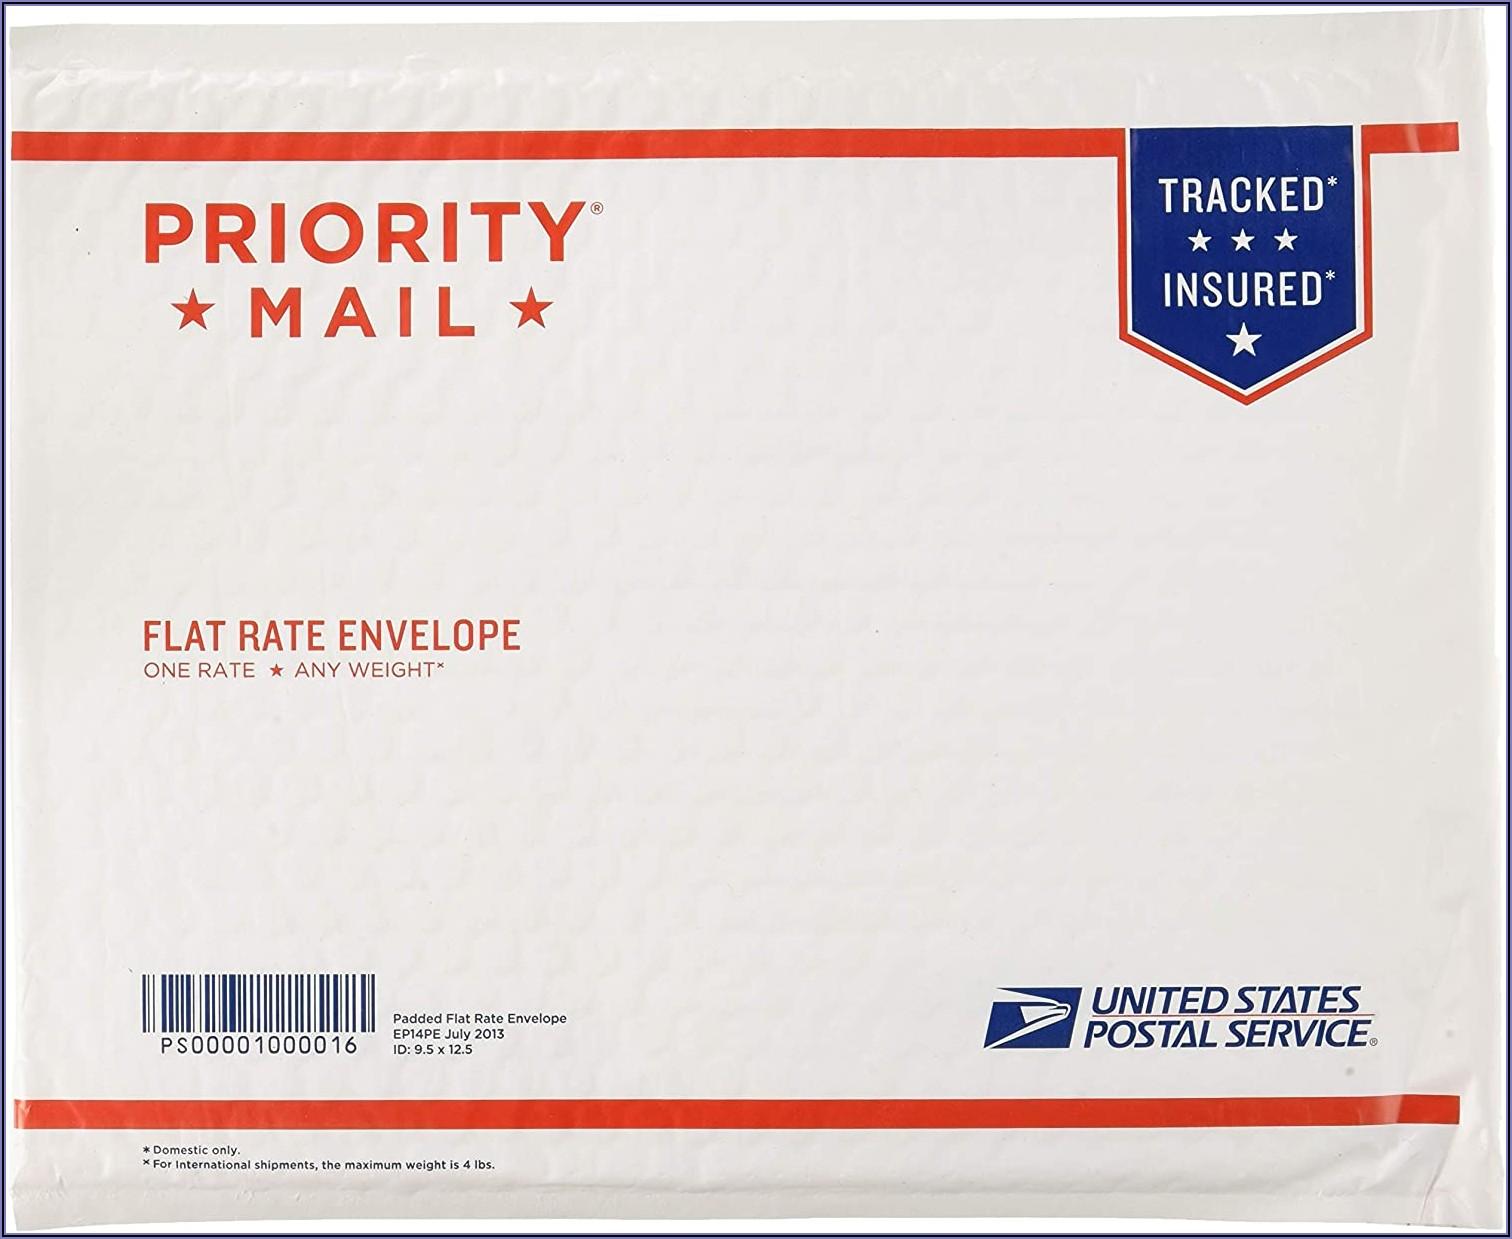 Usps Flat Rate Envelope Dimensions